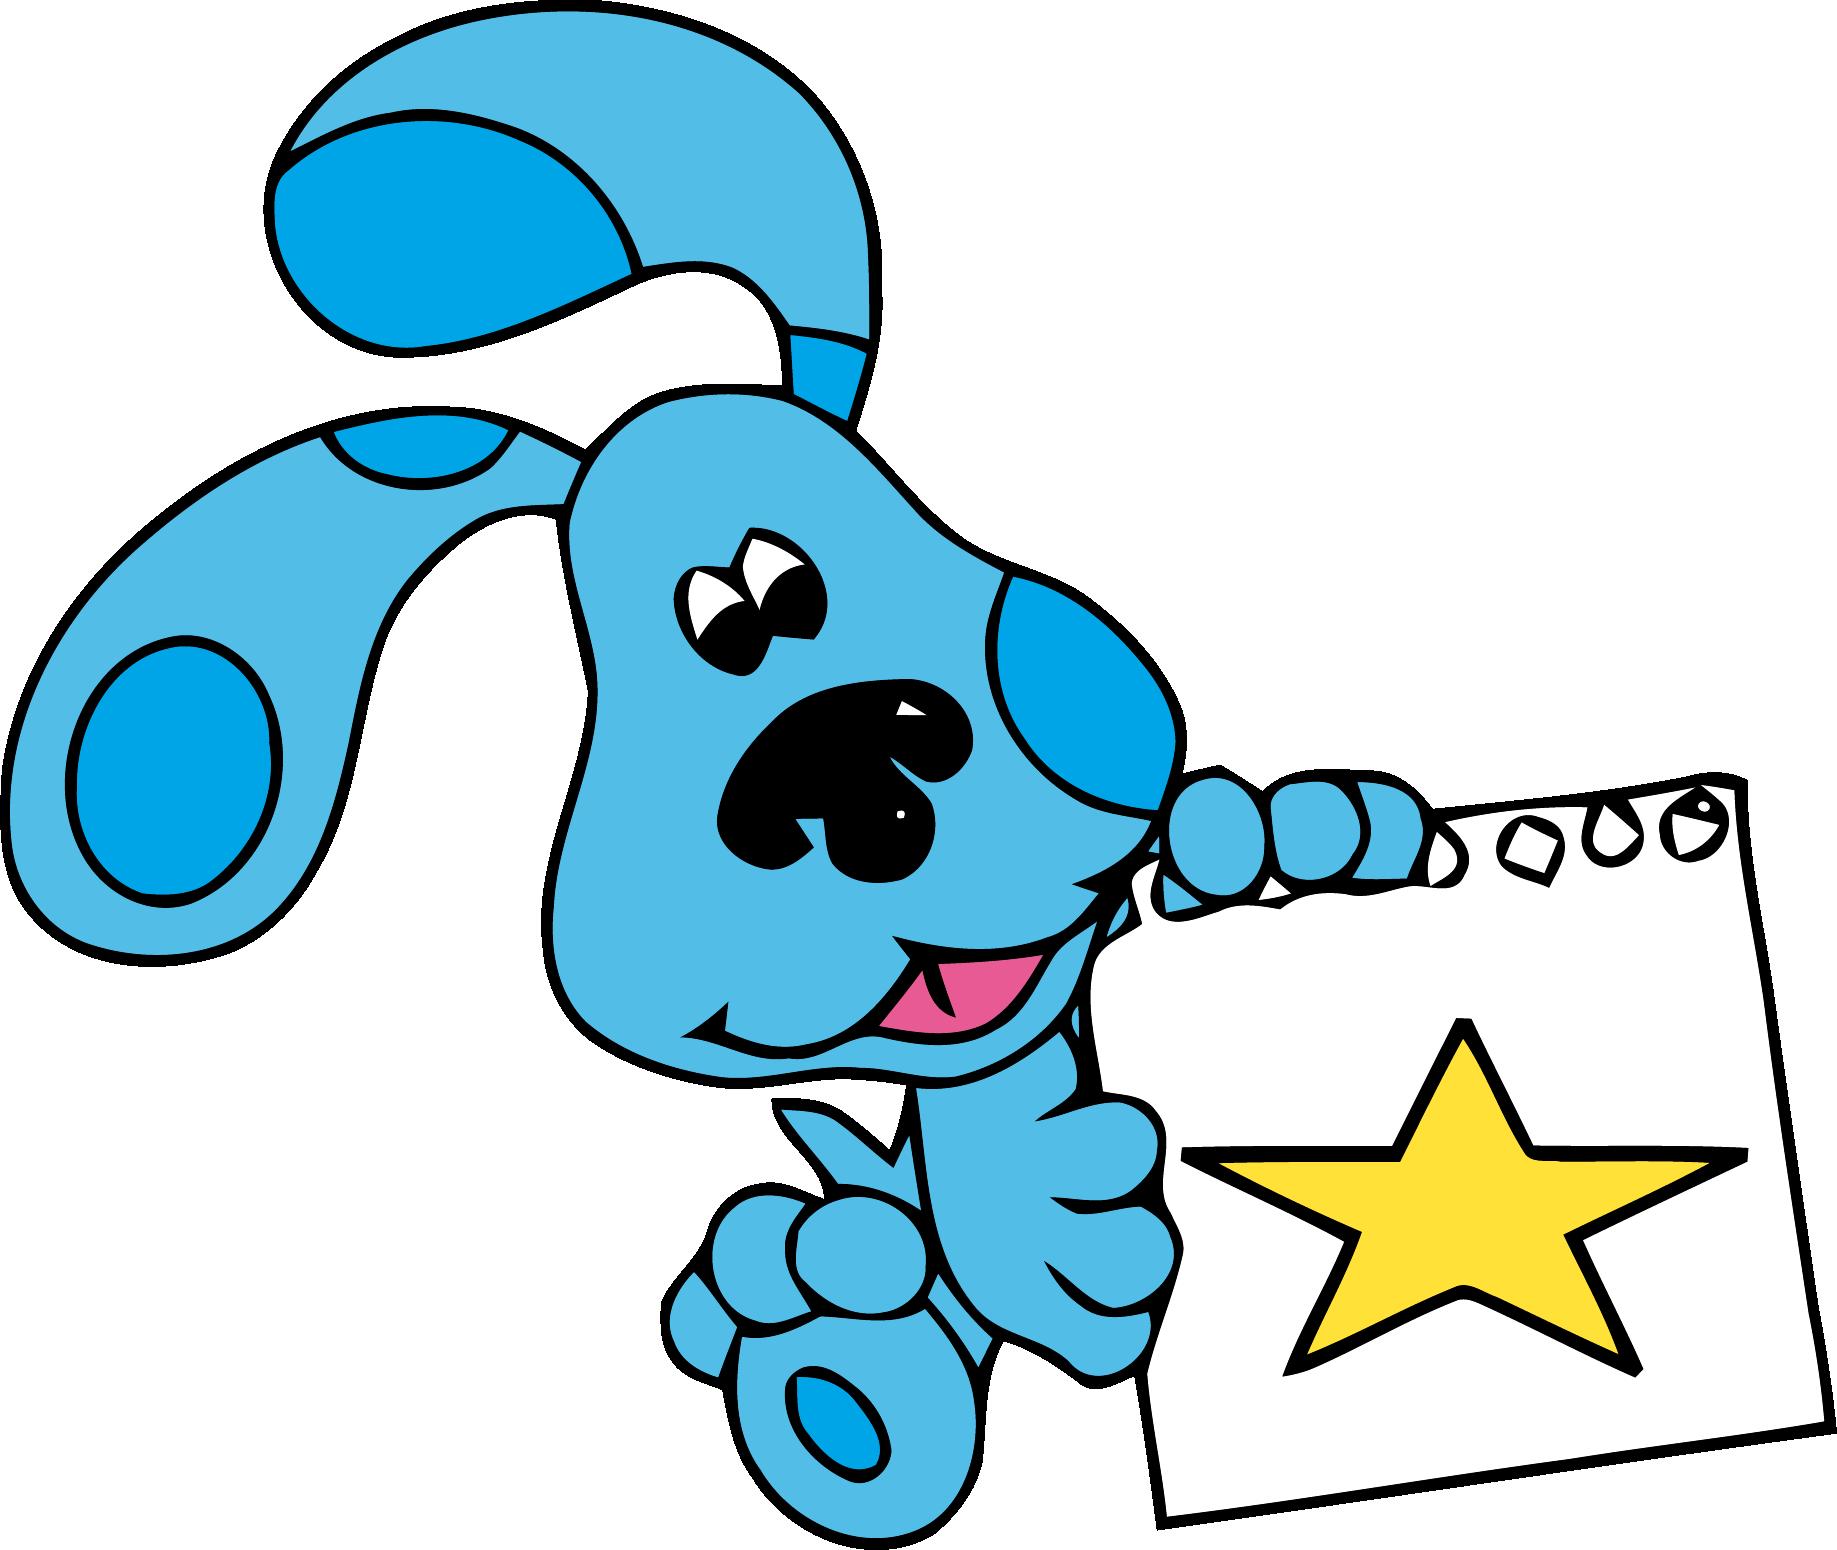 Teal star clipart jpg freeuse stock Blue's Clues Clip Art Star Clipart Png - Clipartly.comClipartly.com jpg freeuse stock